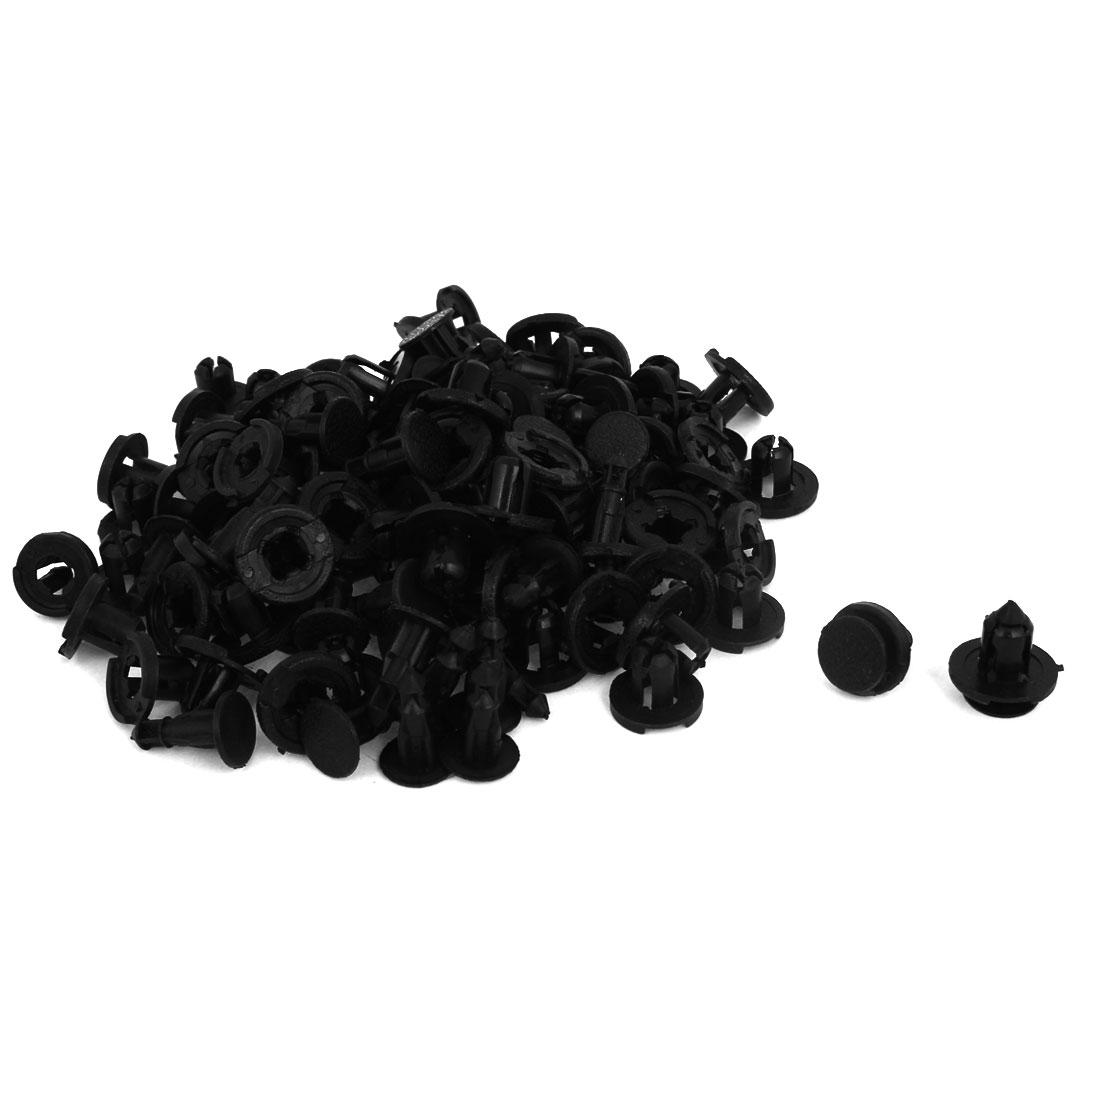 100 Pcs Black Plastic Rivet Trim Fastener Moulding Clips 8mm x 13mm x 18mm